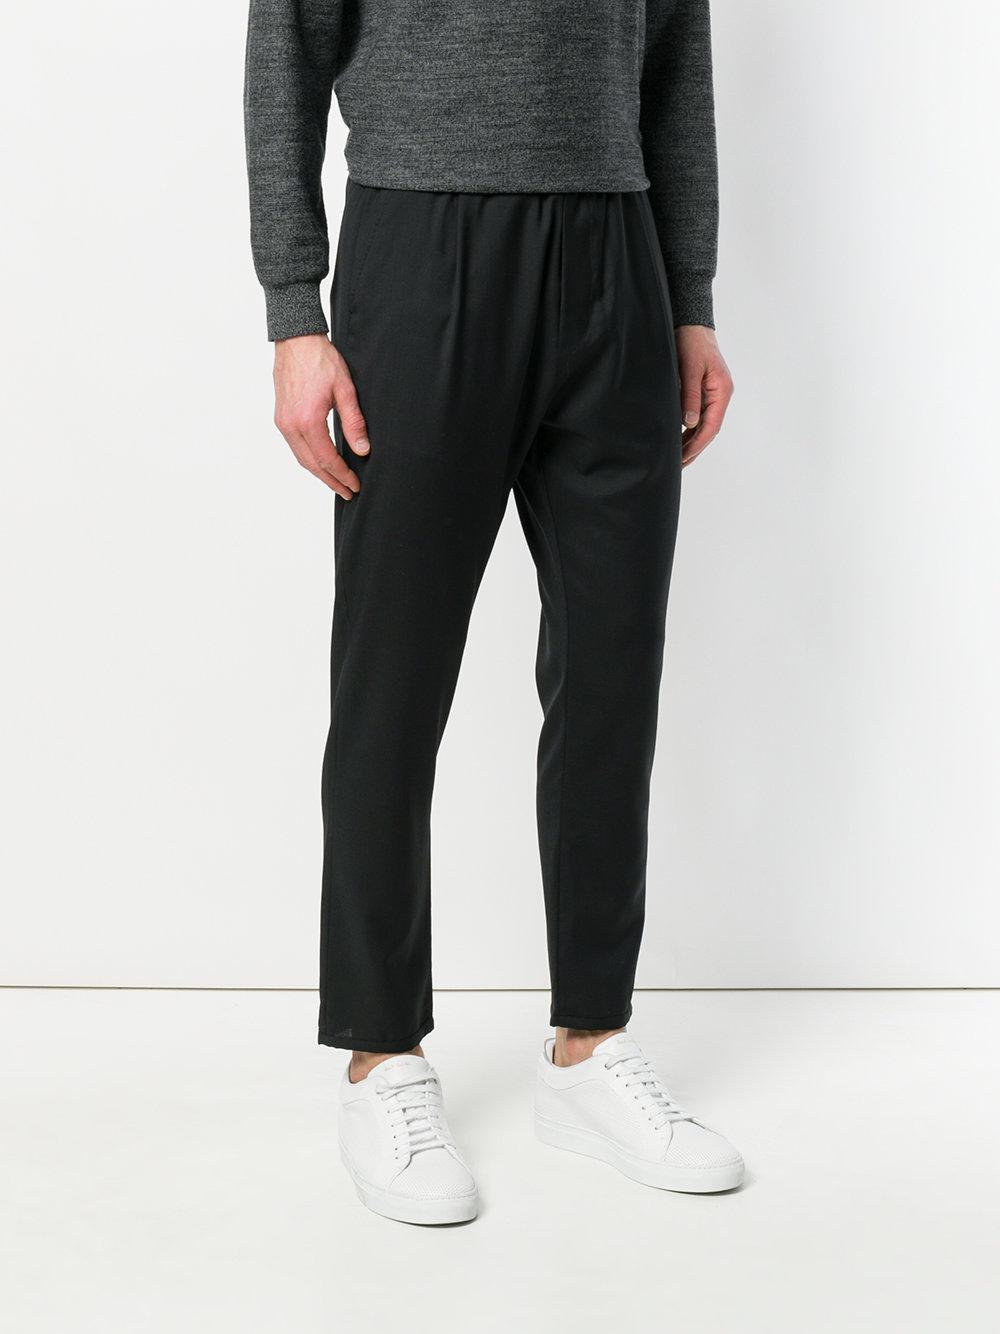 Low Brand Wool Straight Leg Trousers in Black for Men